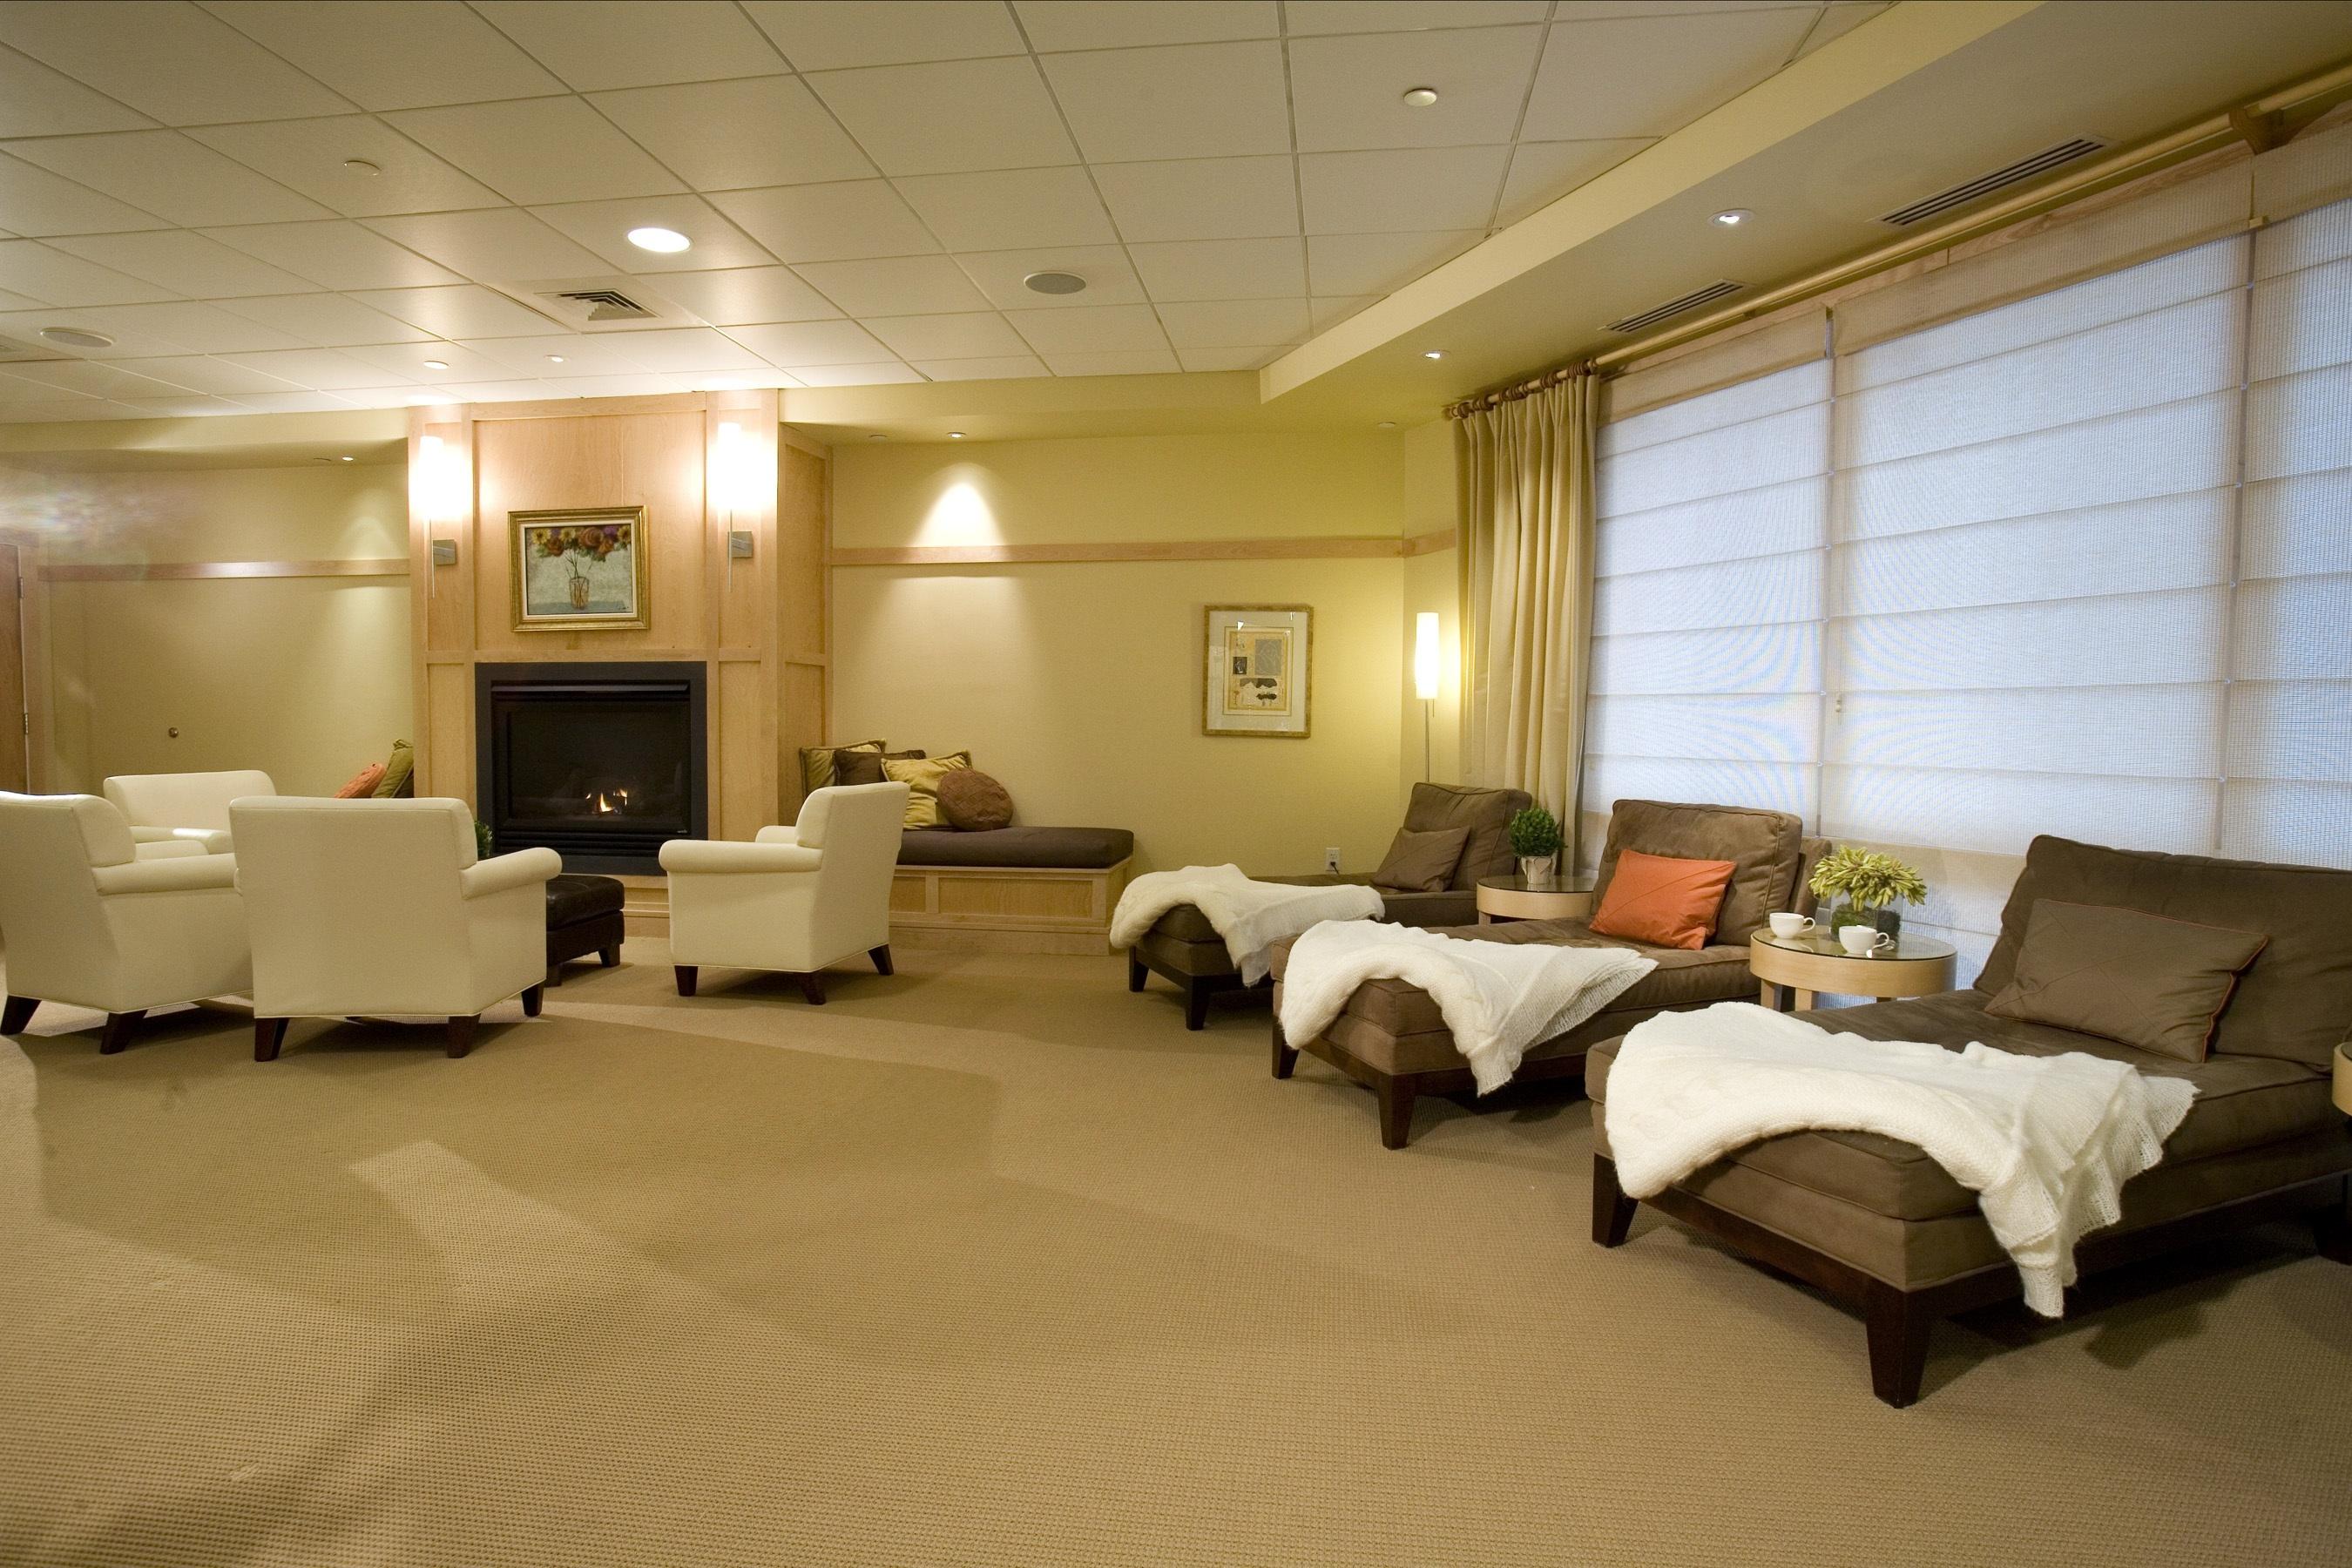 Spa news everythingspa 39 s blog for Hotel salon